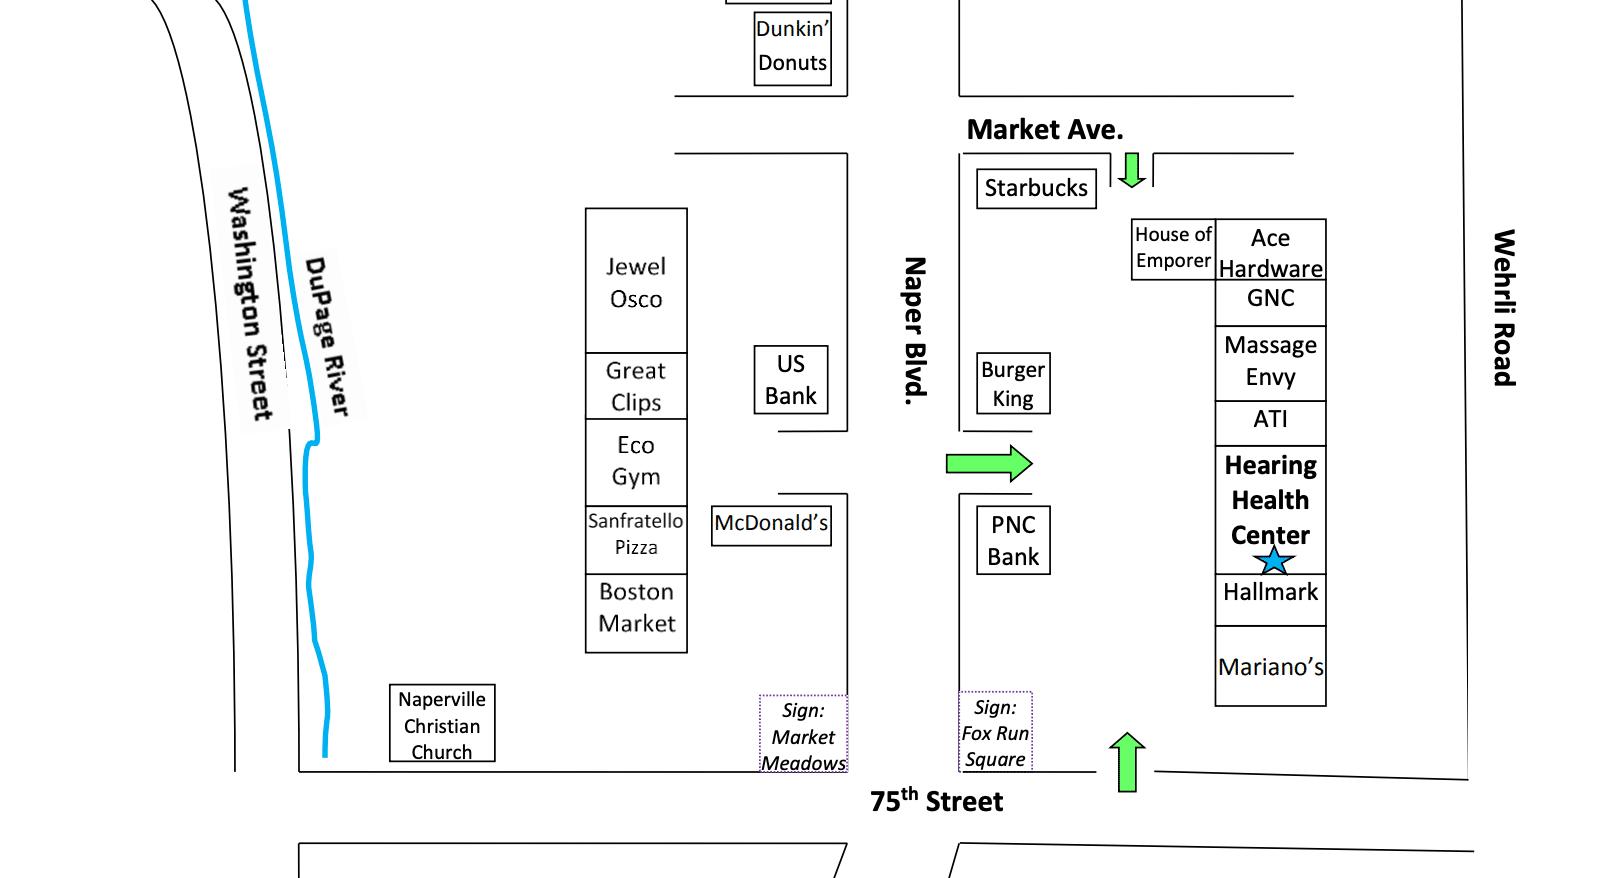 Hearing Health Center Naperville Location